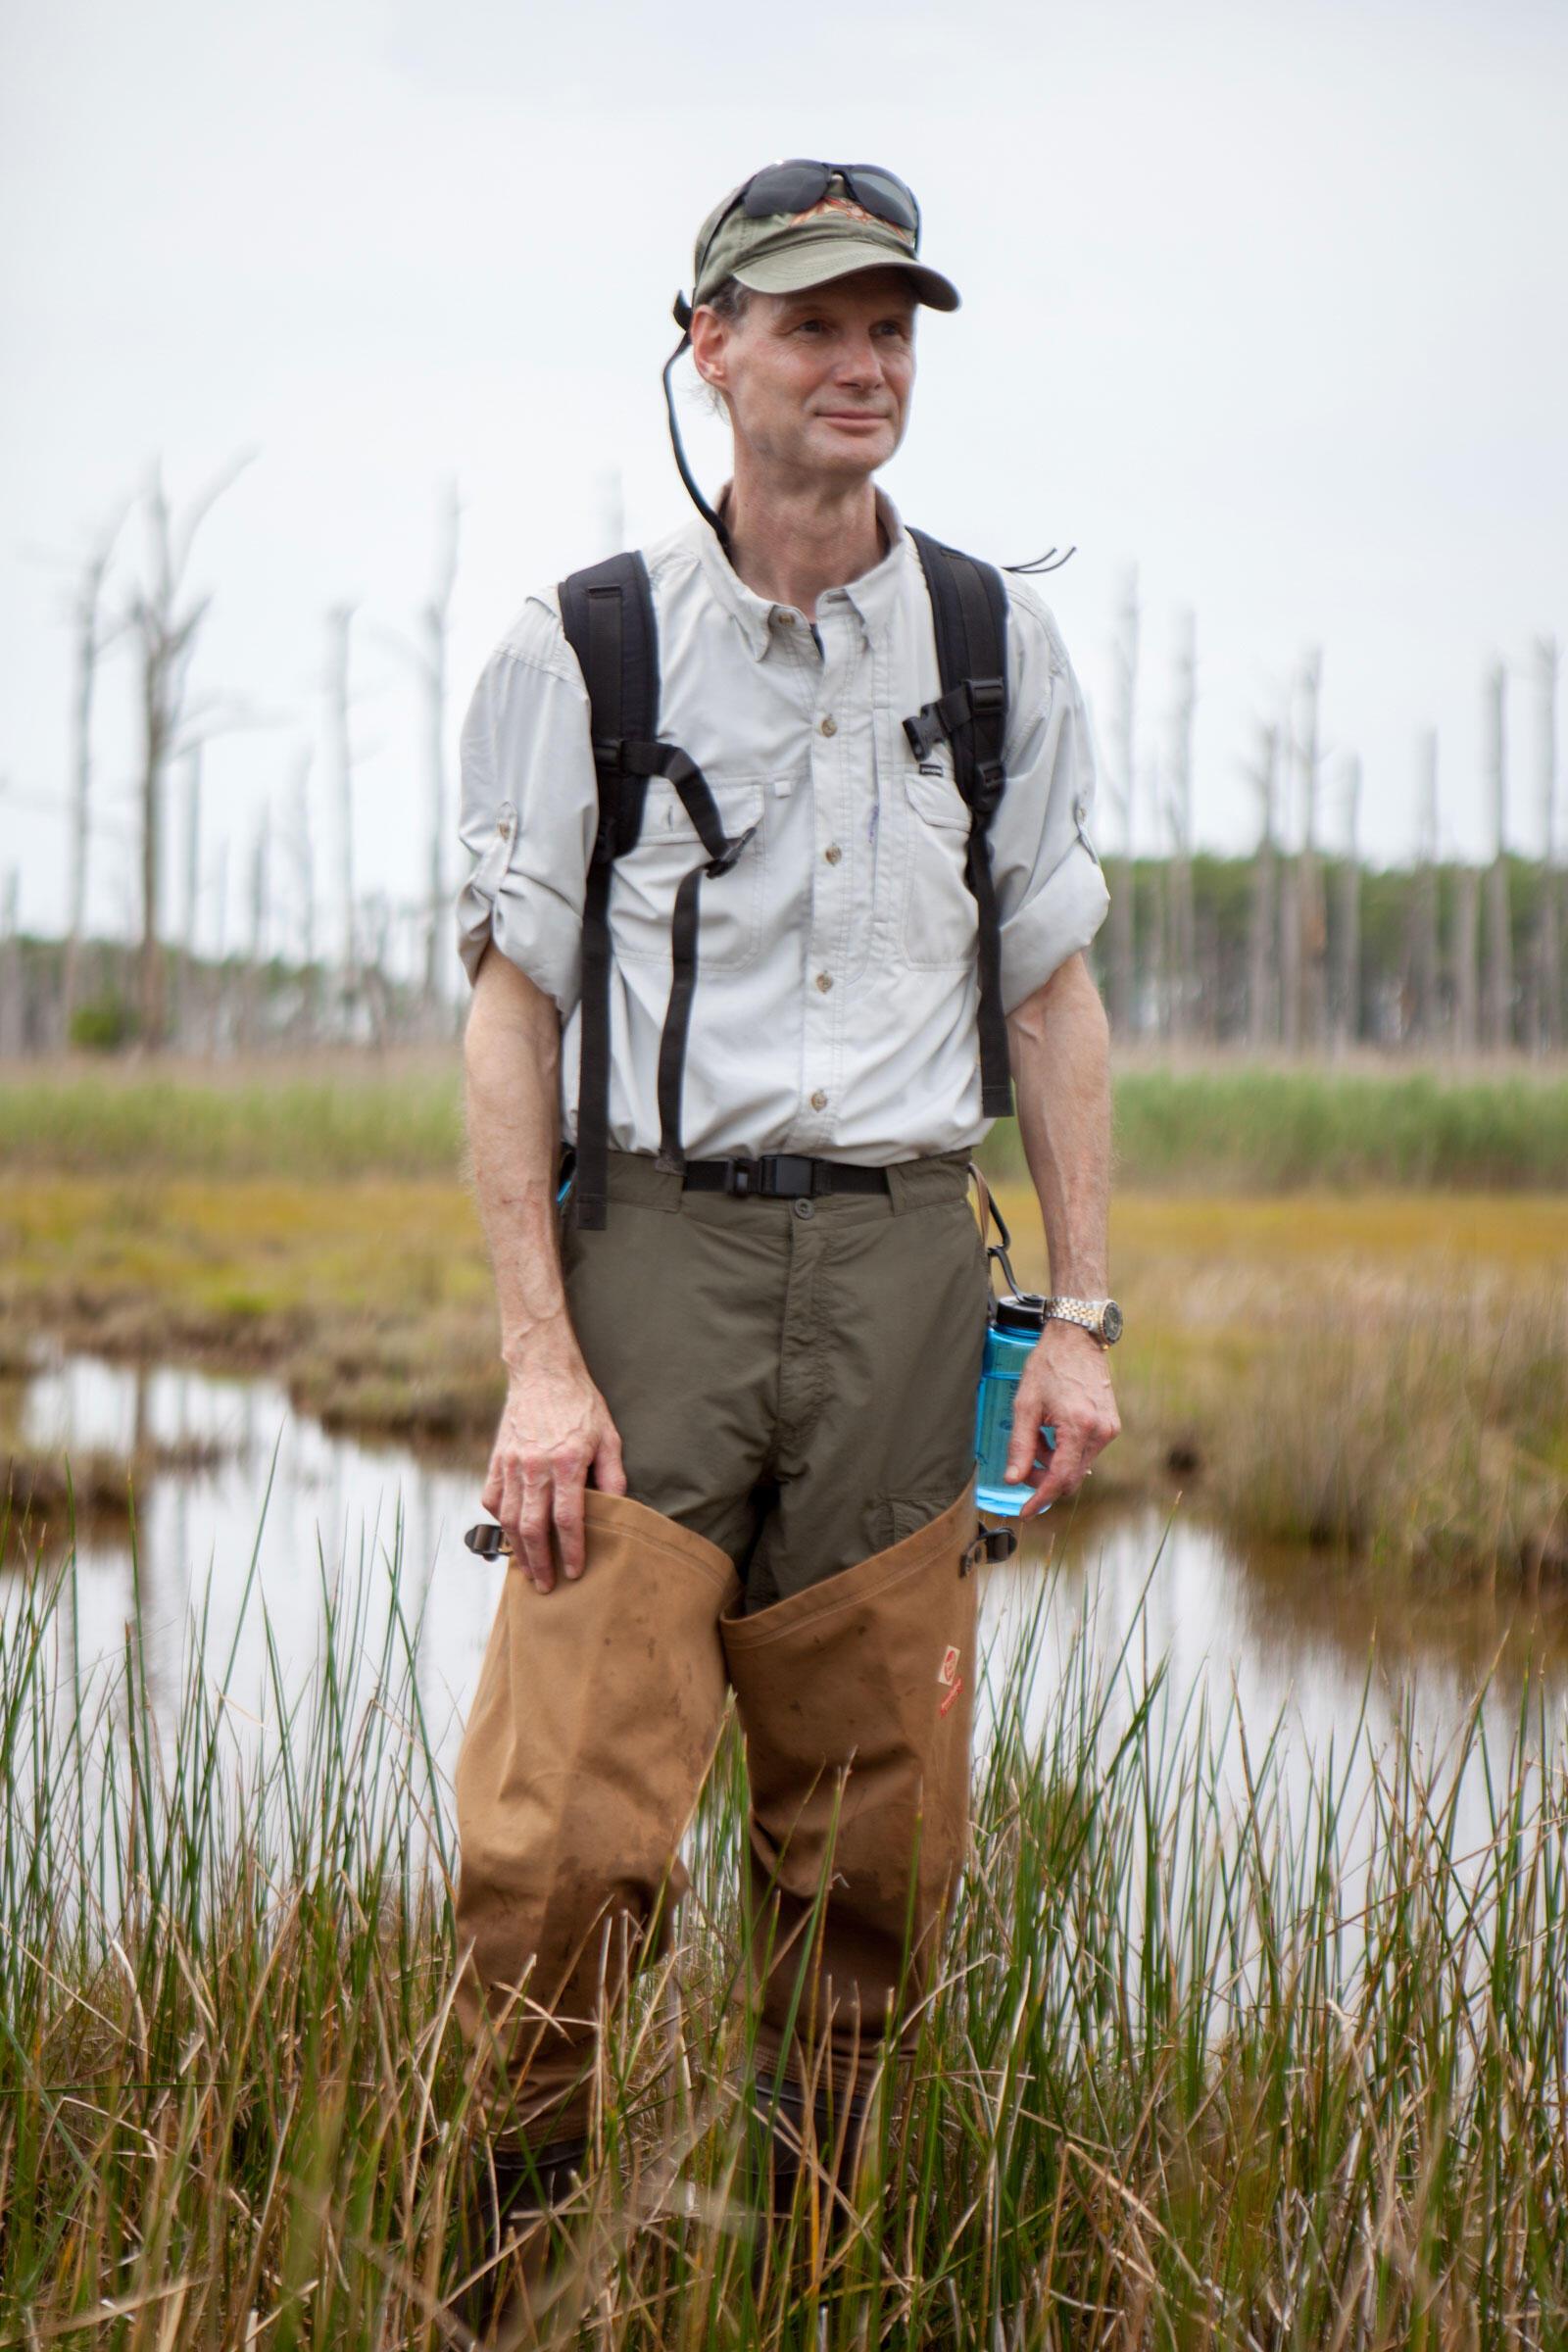 Hugh Simmons, president of the Chesapeake Audubon Society and NAS board member, hikes through Farm Creek Marsh before the restoration project begins. Camilla Cerea/Audubon